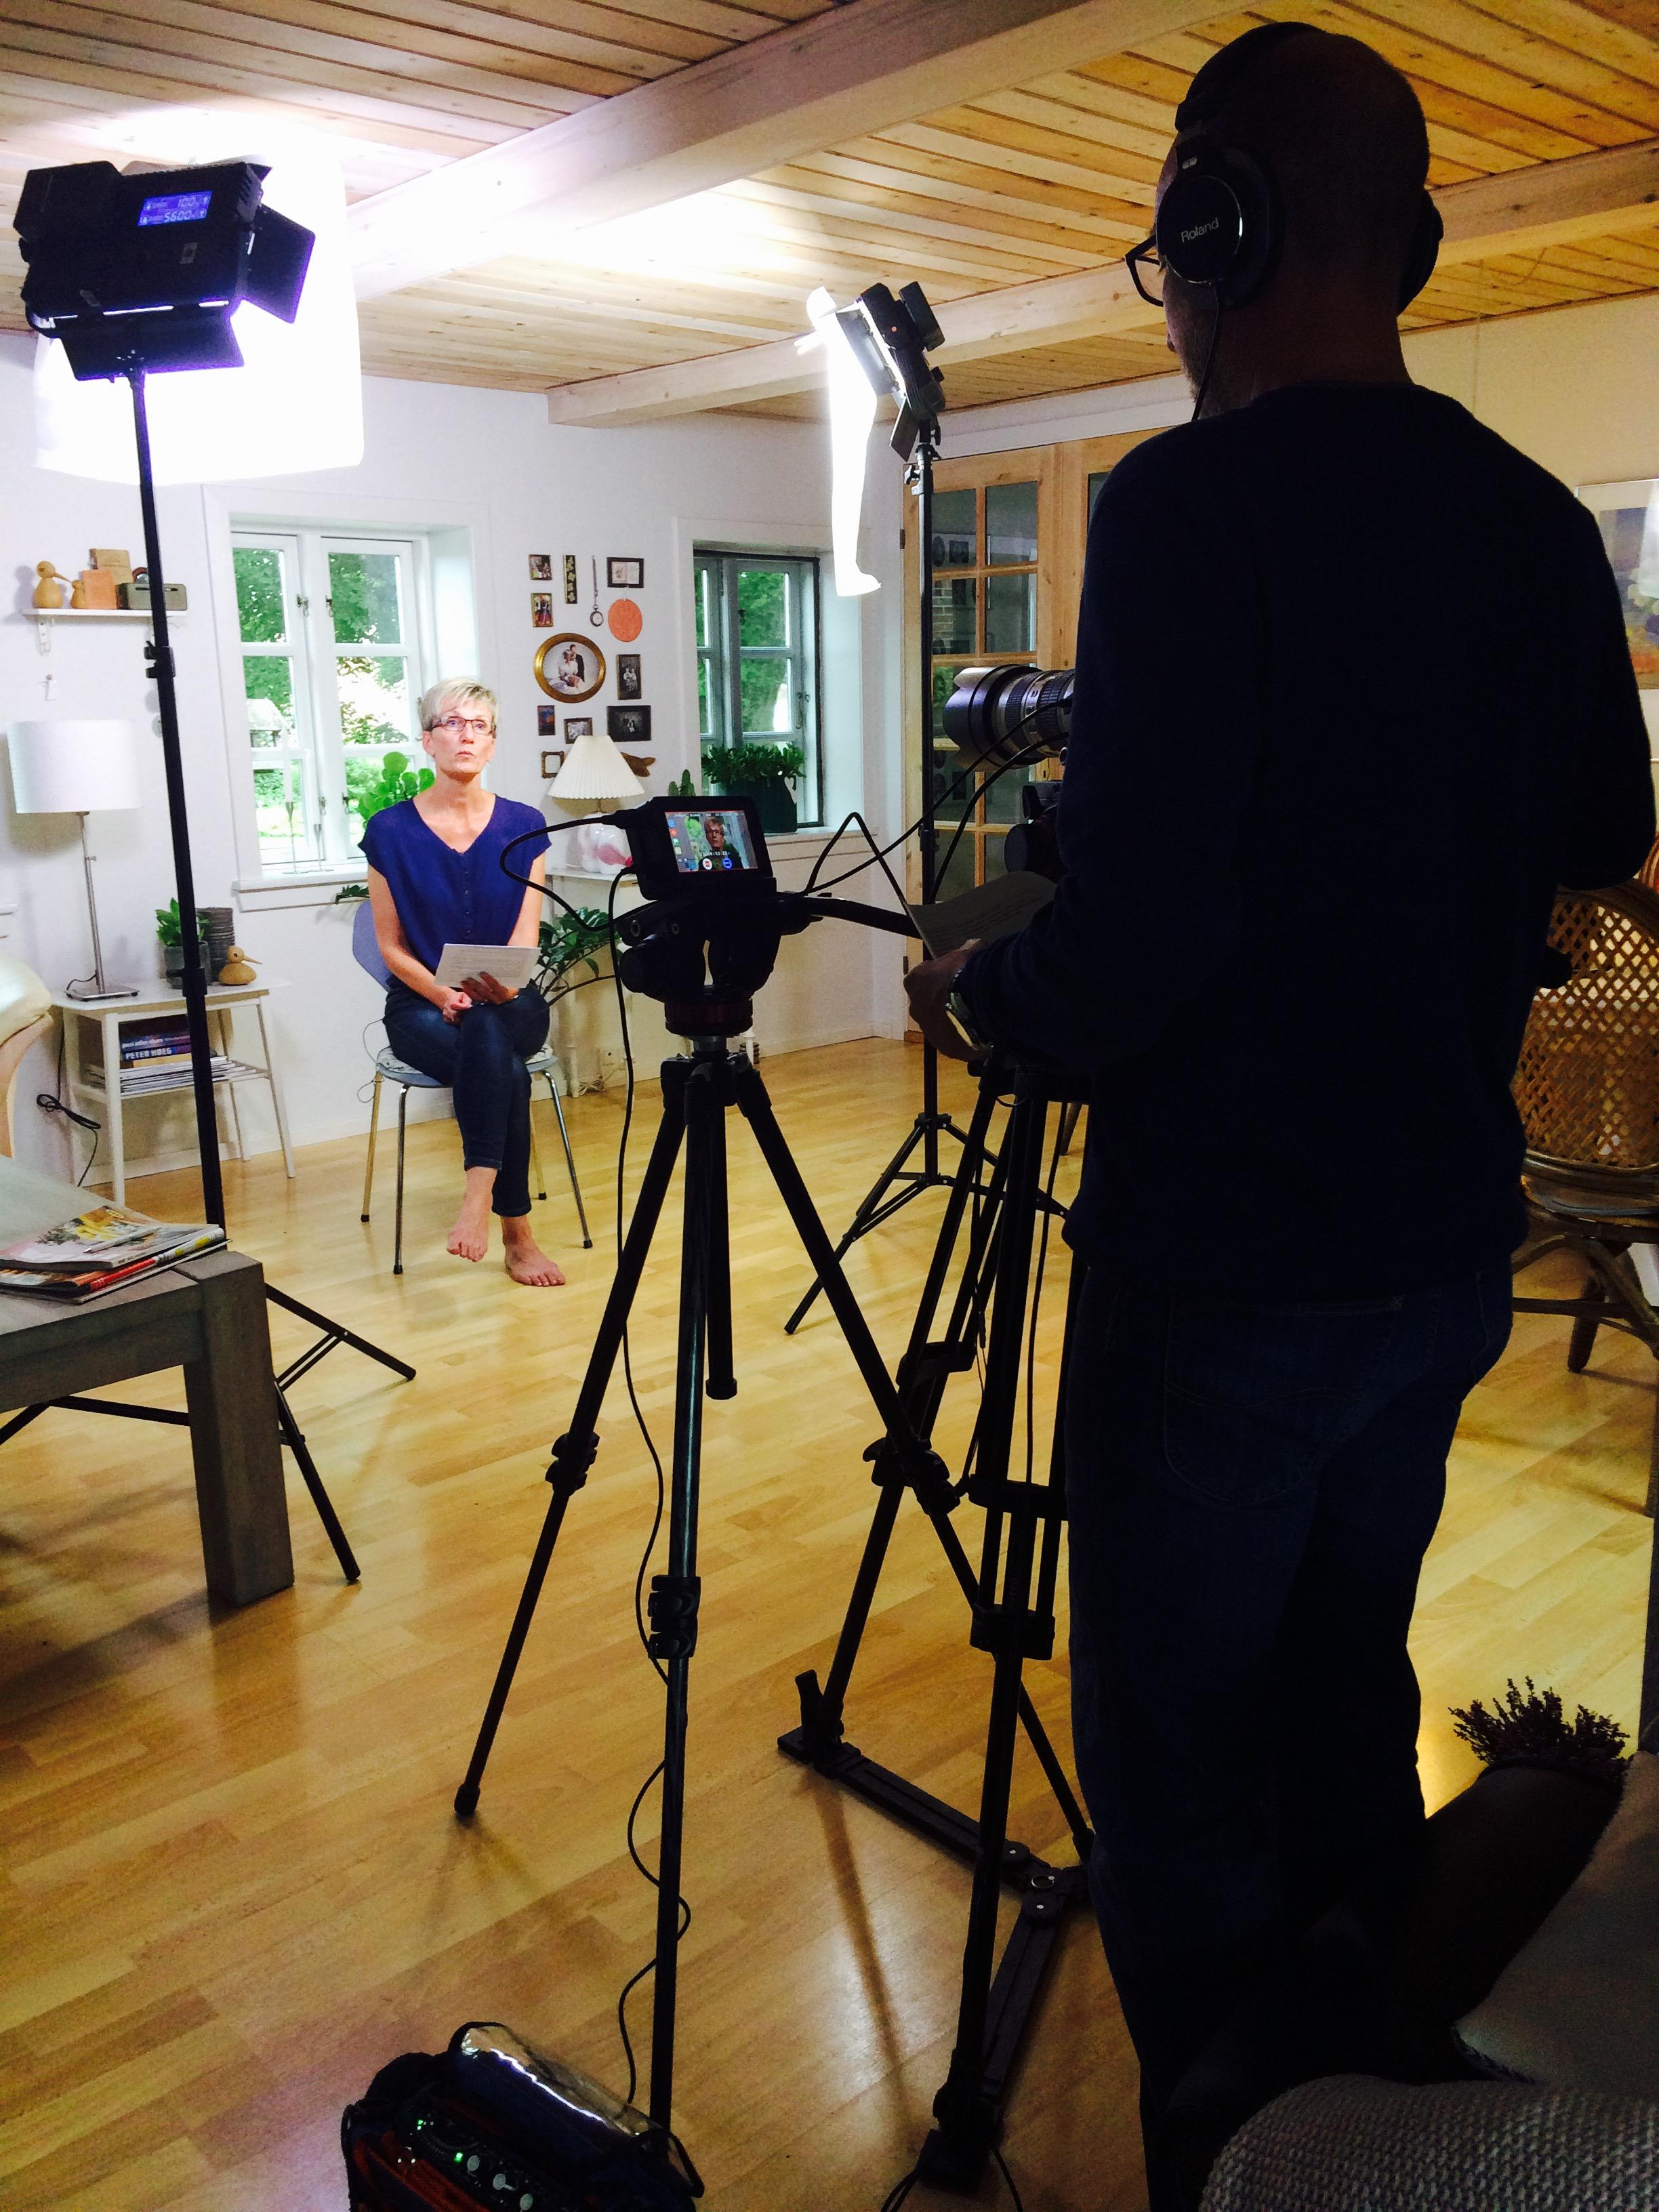 Entrevista, produccion audiovisual